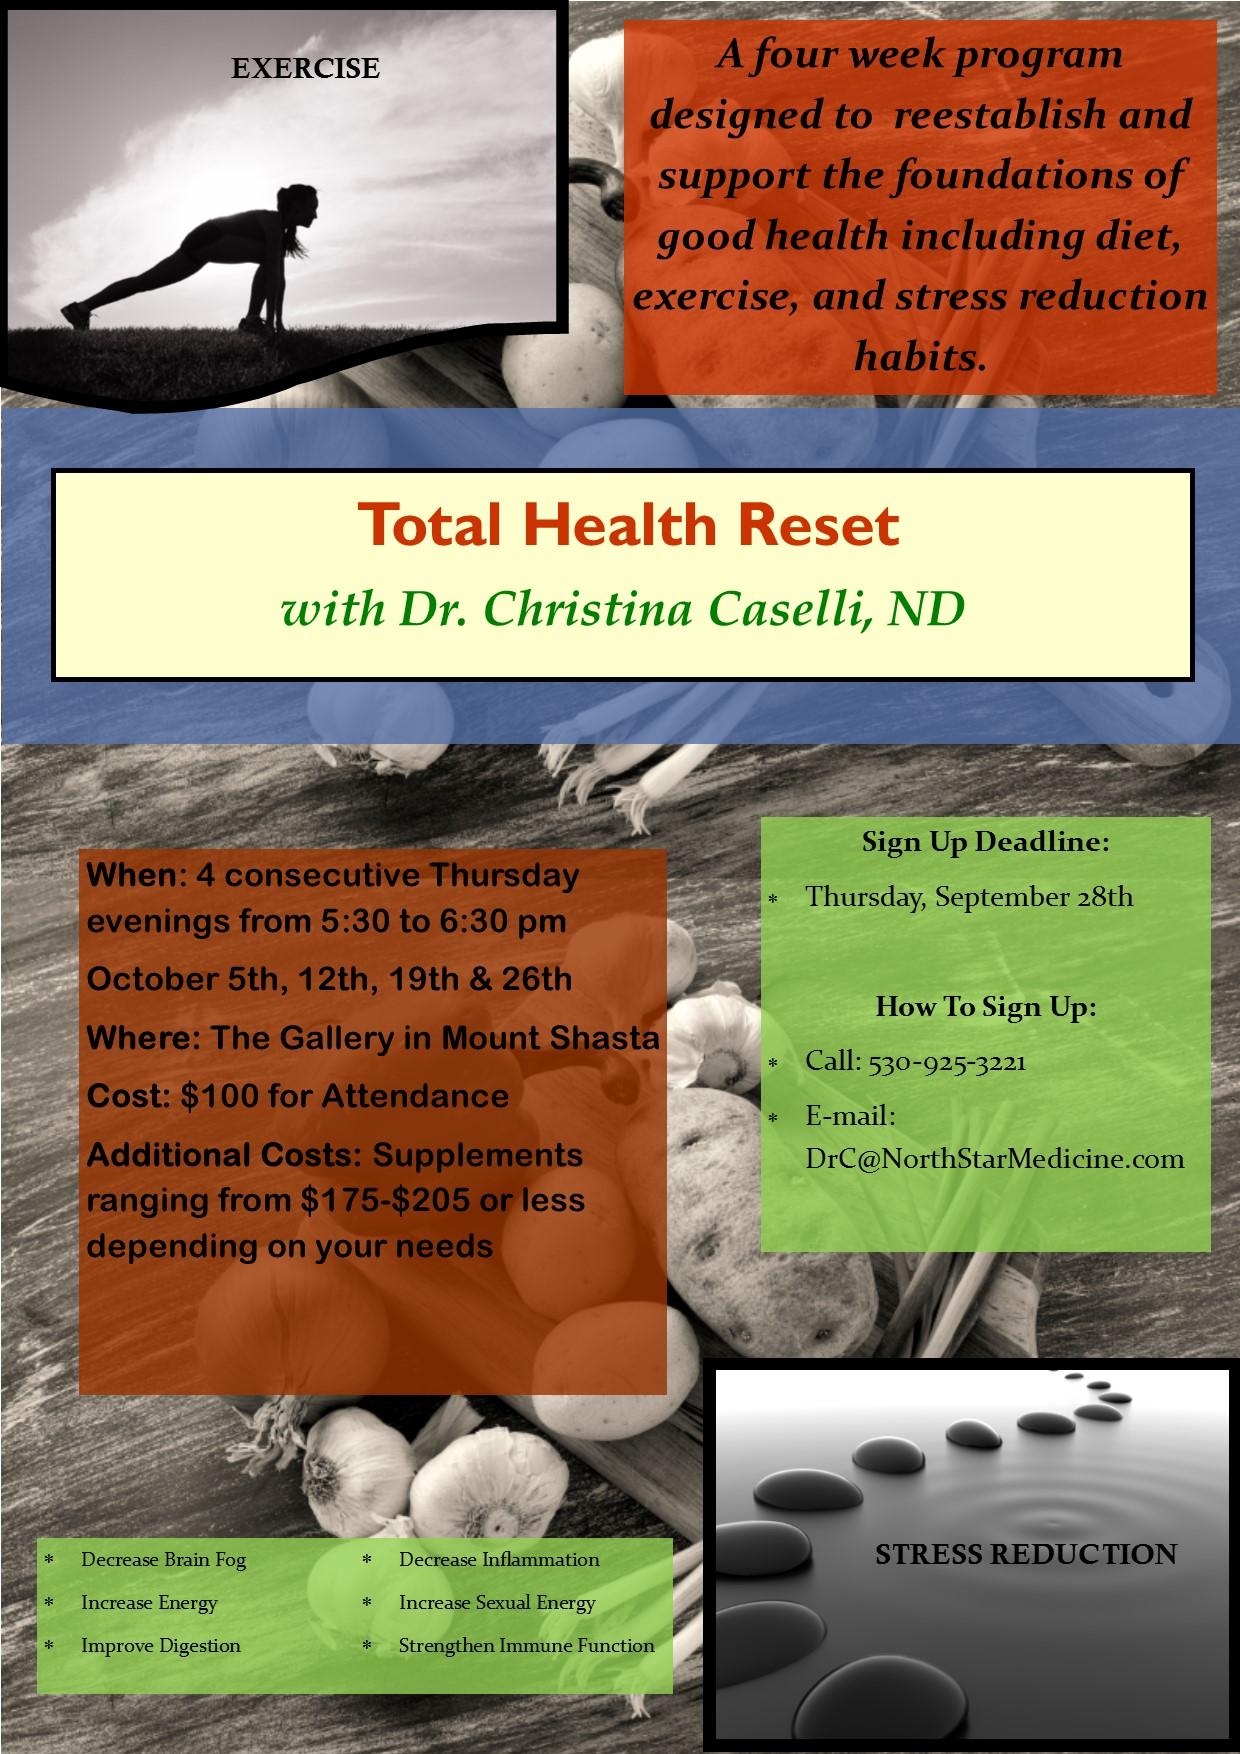 Total Health Reset